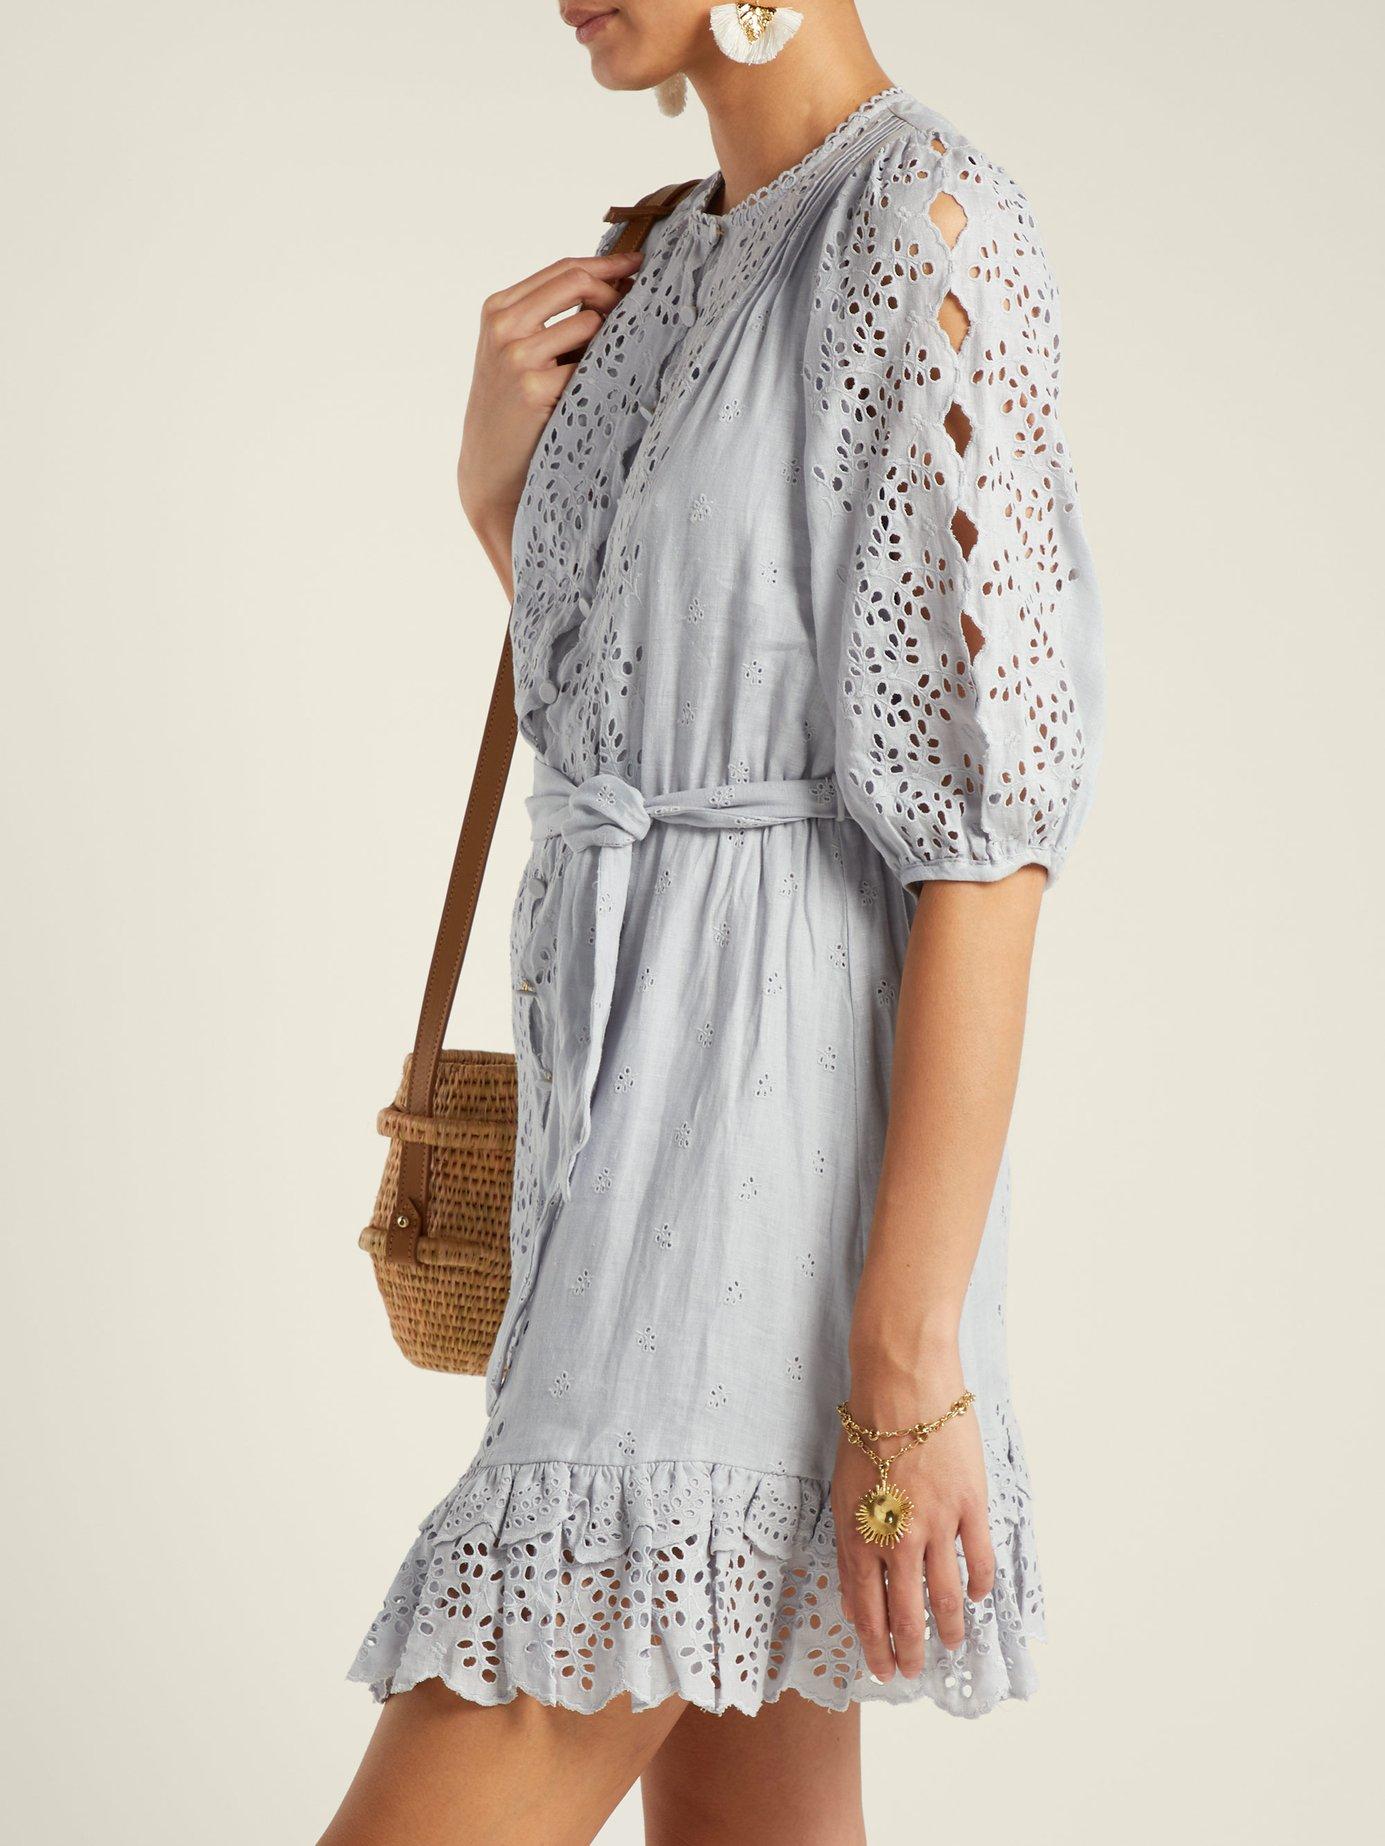 Iris scallop-lace linen dress by Zimmermann